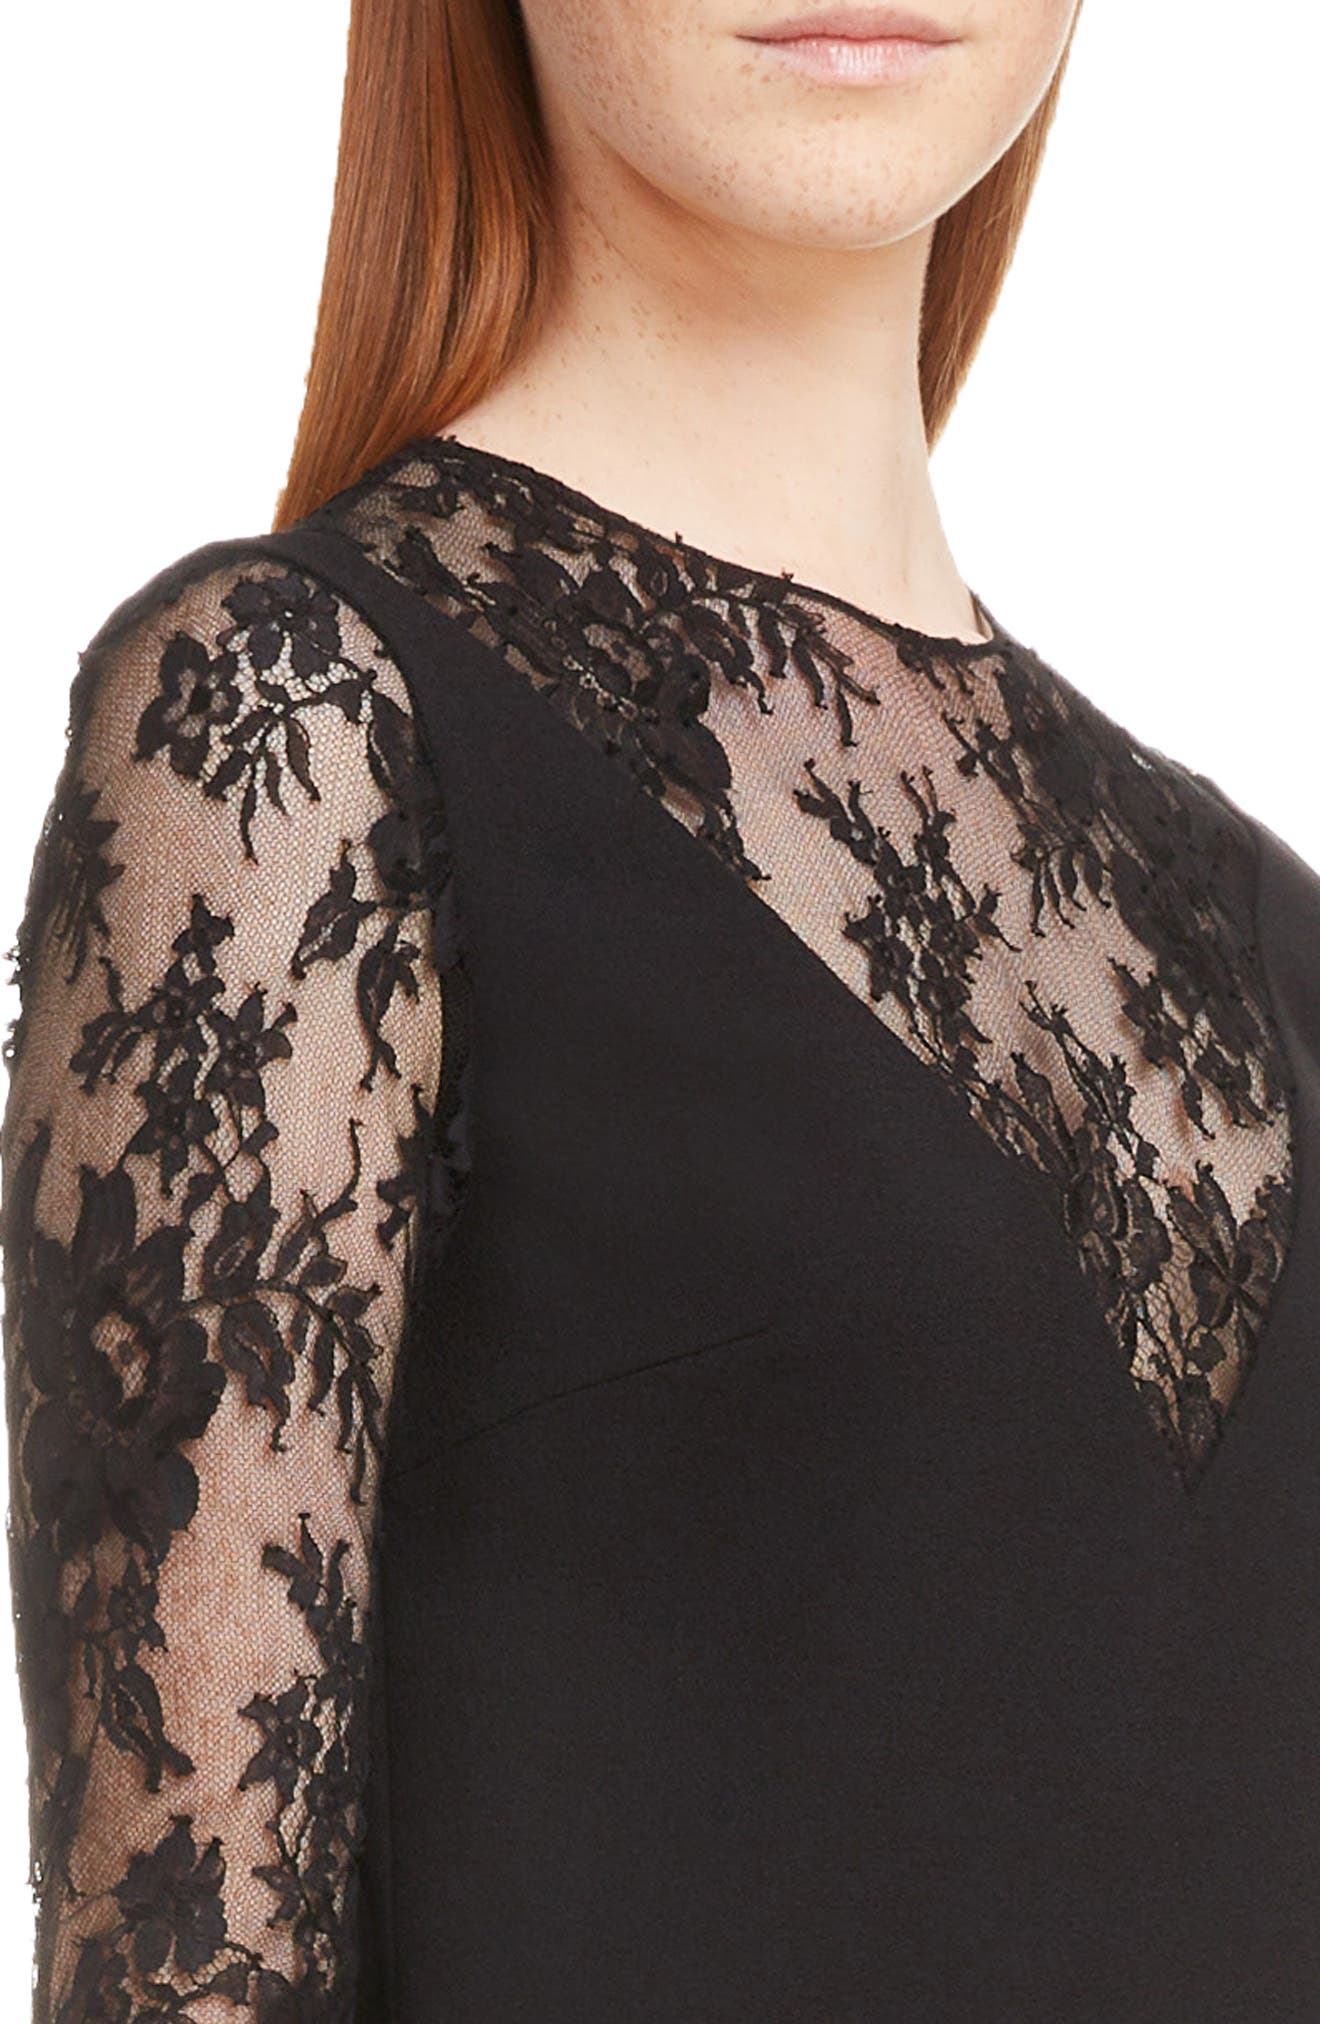 Lace Illusion Dress,                             Alternate thumbnail 4, color,                             001-BLACK